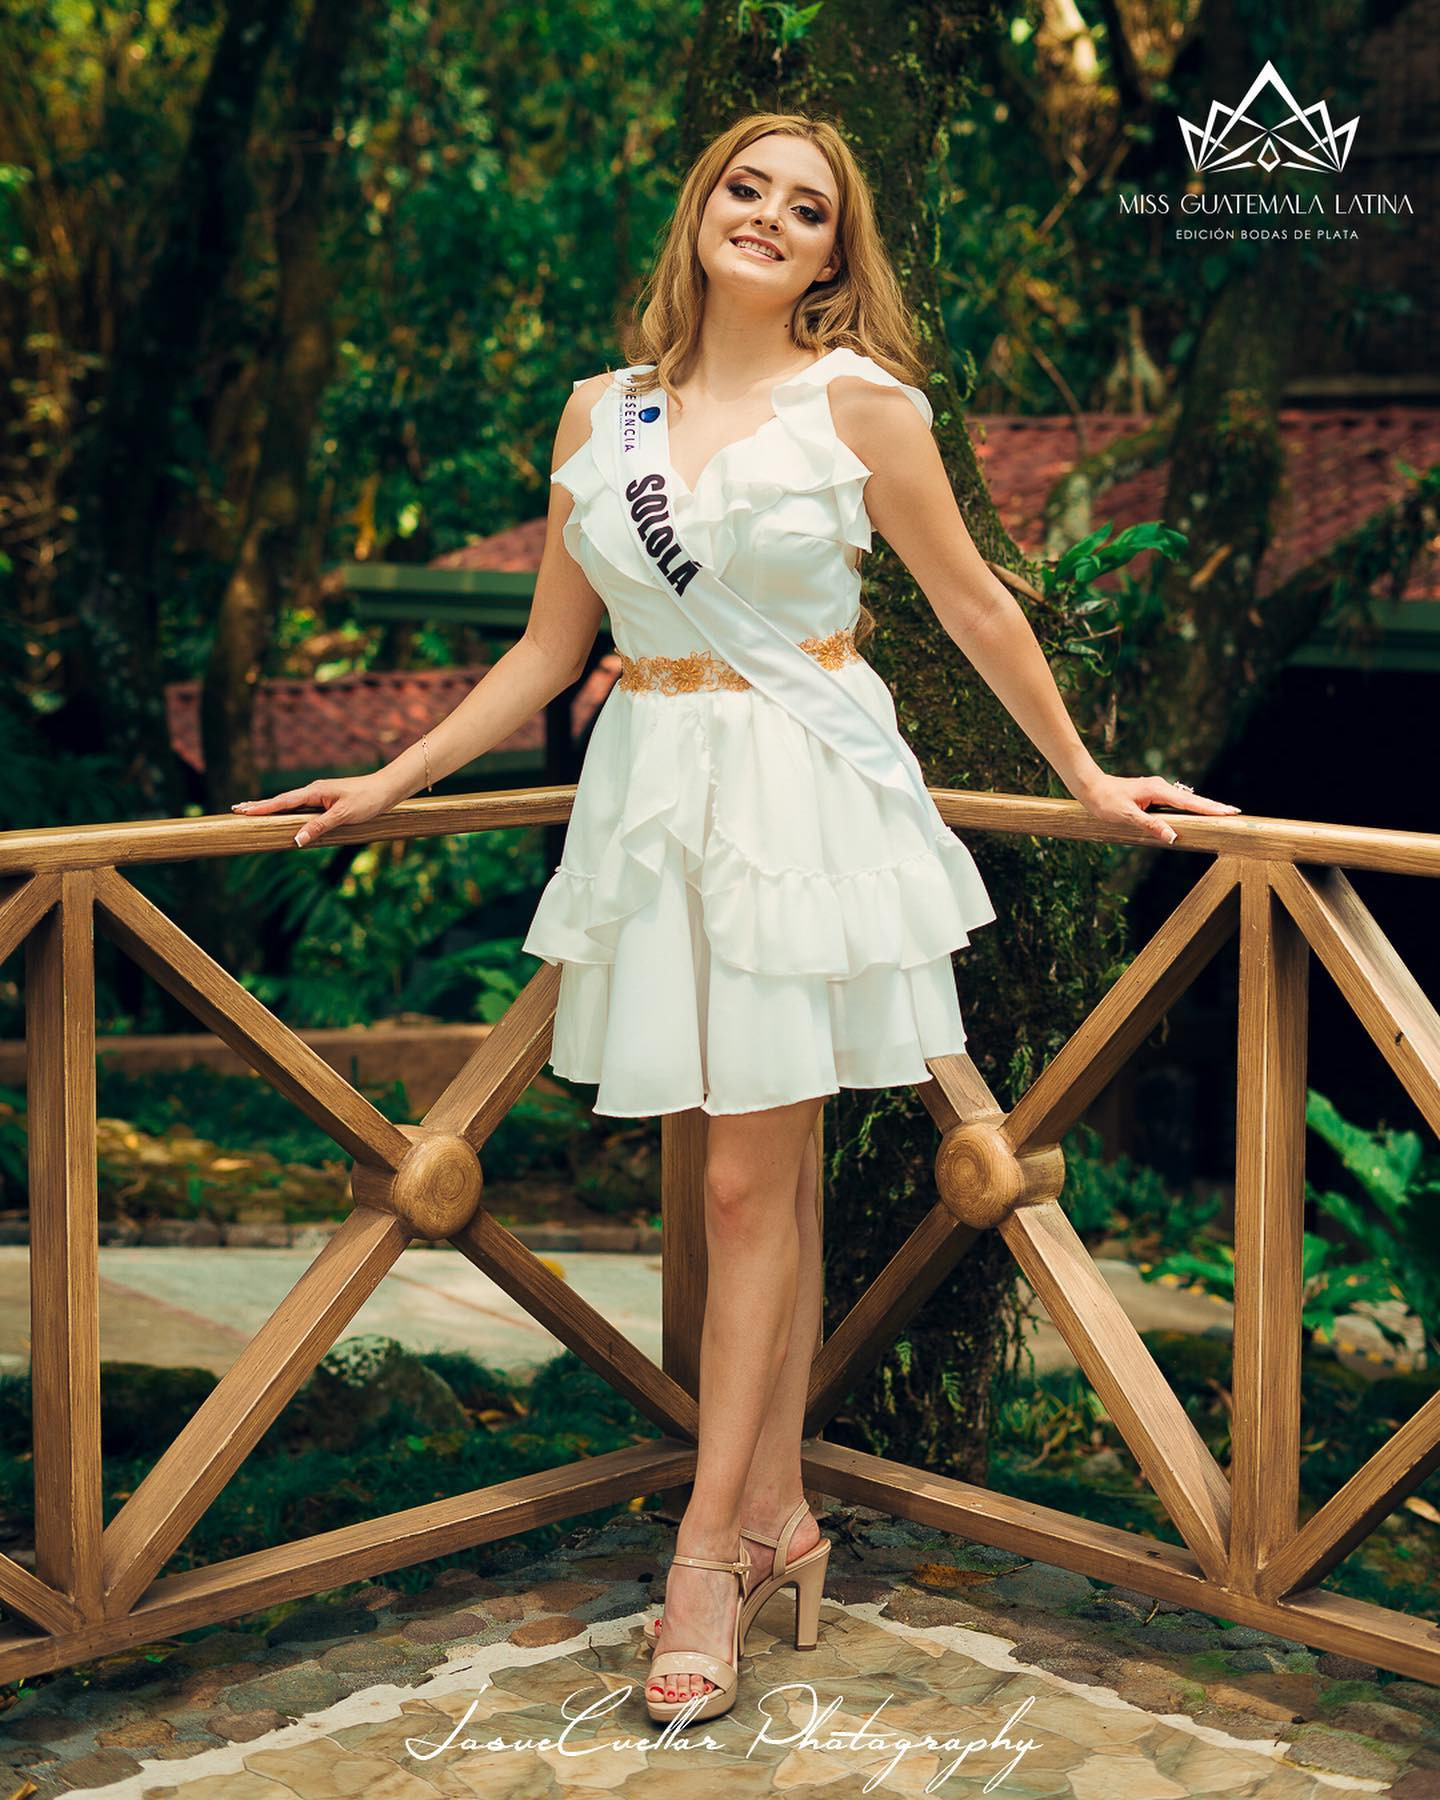 candidatas a miss guatemala latina 2021. final: 30 de abril. - Página 11 BFN7v1